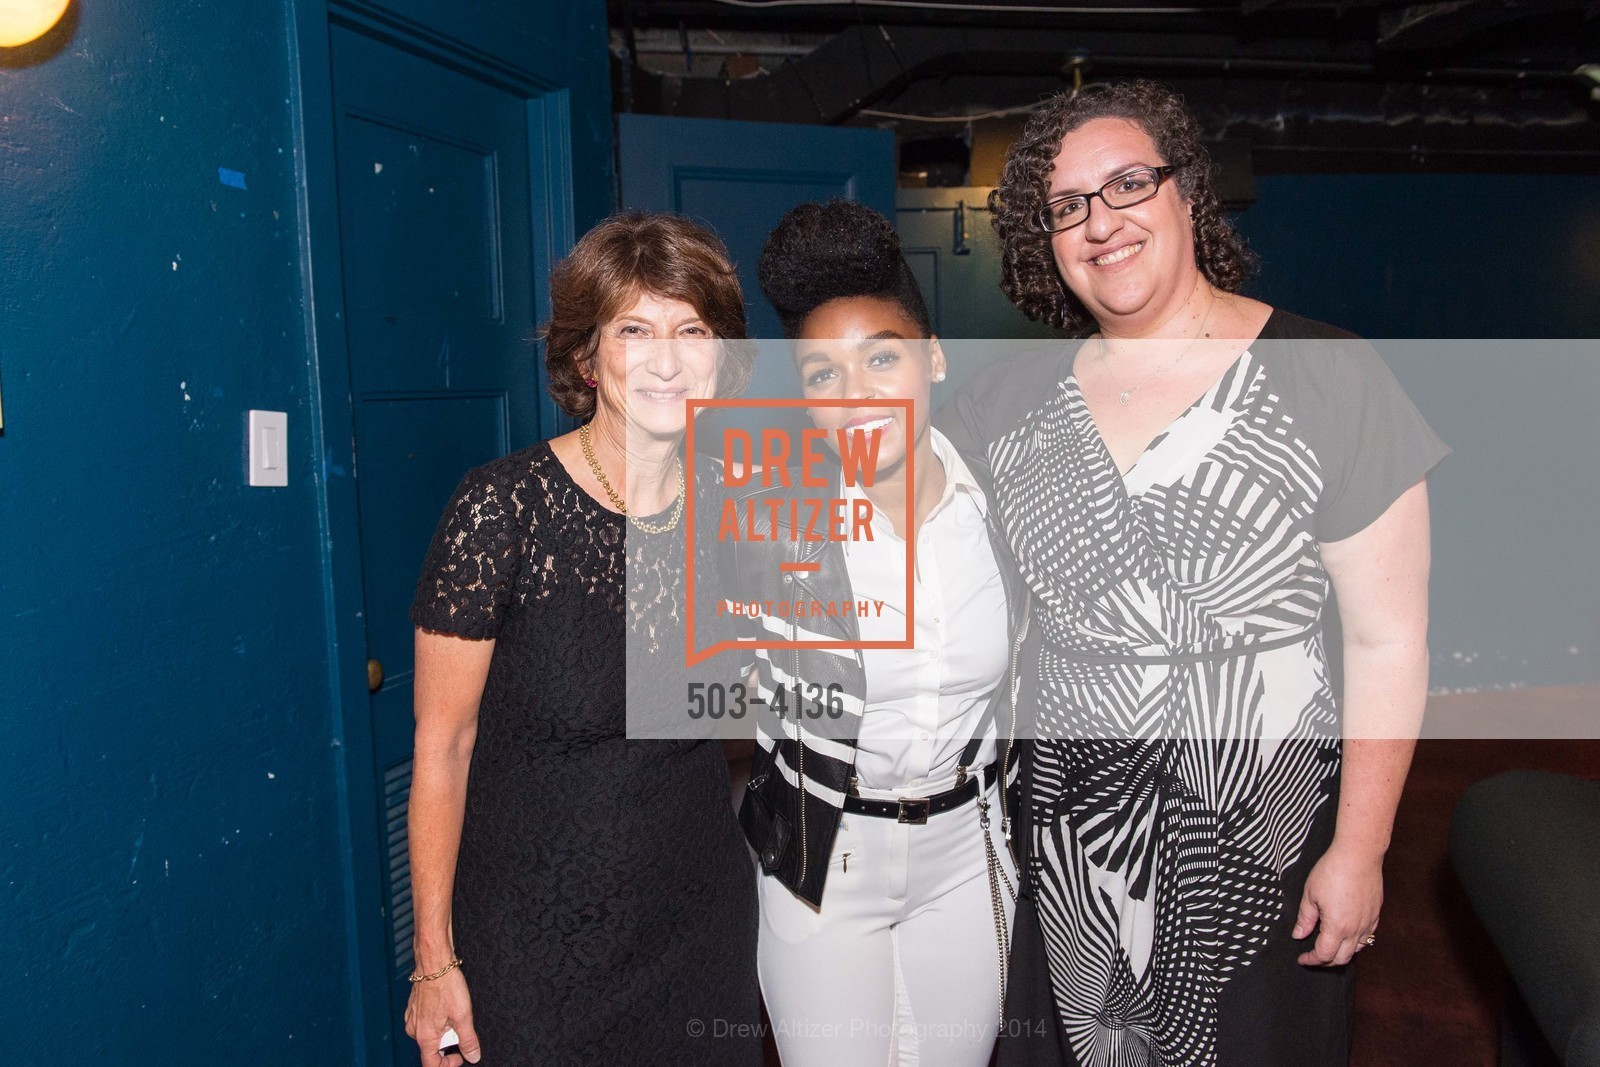 Carla Javits, Janelle Monae, Christina Garcia, Photo #503-4136